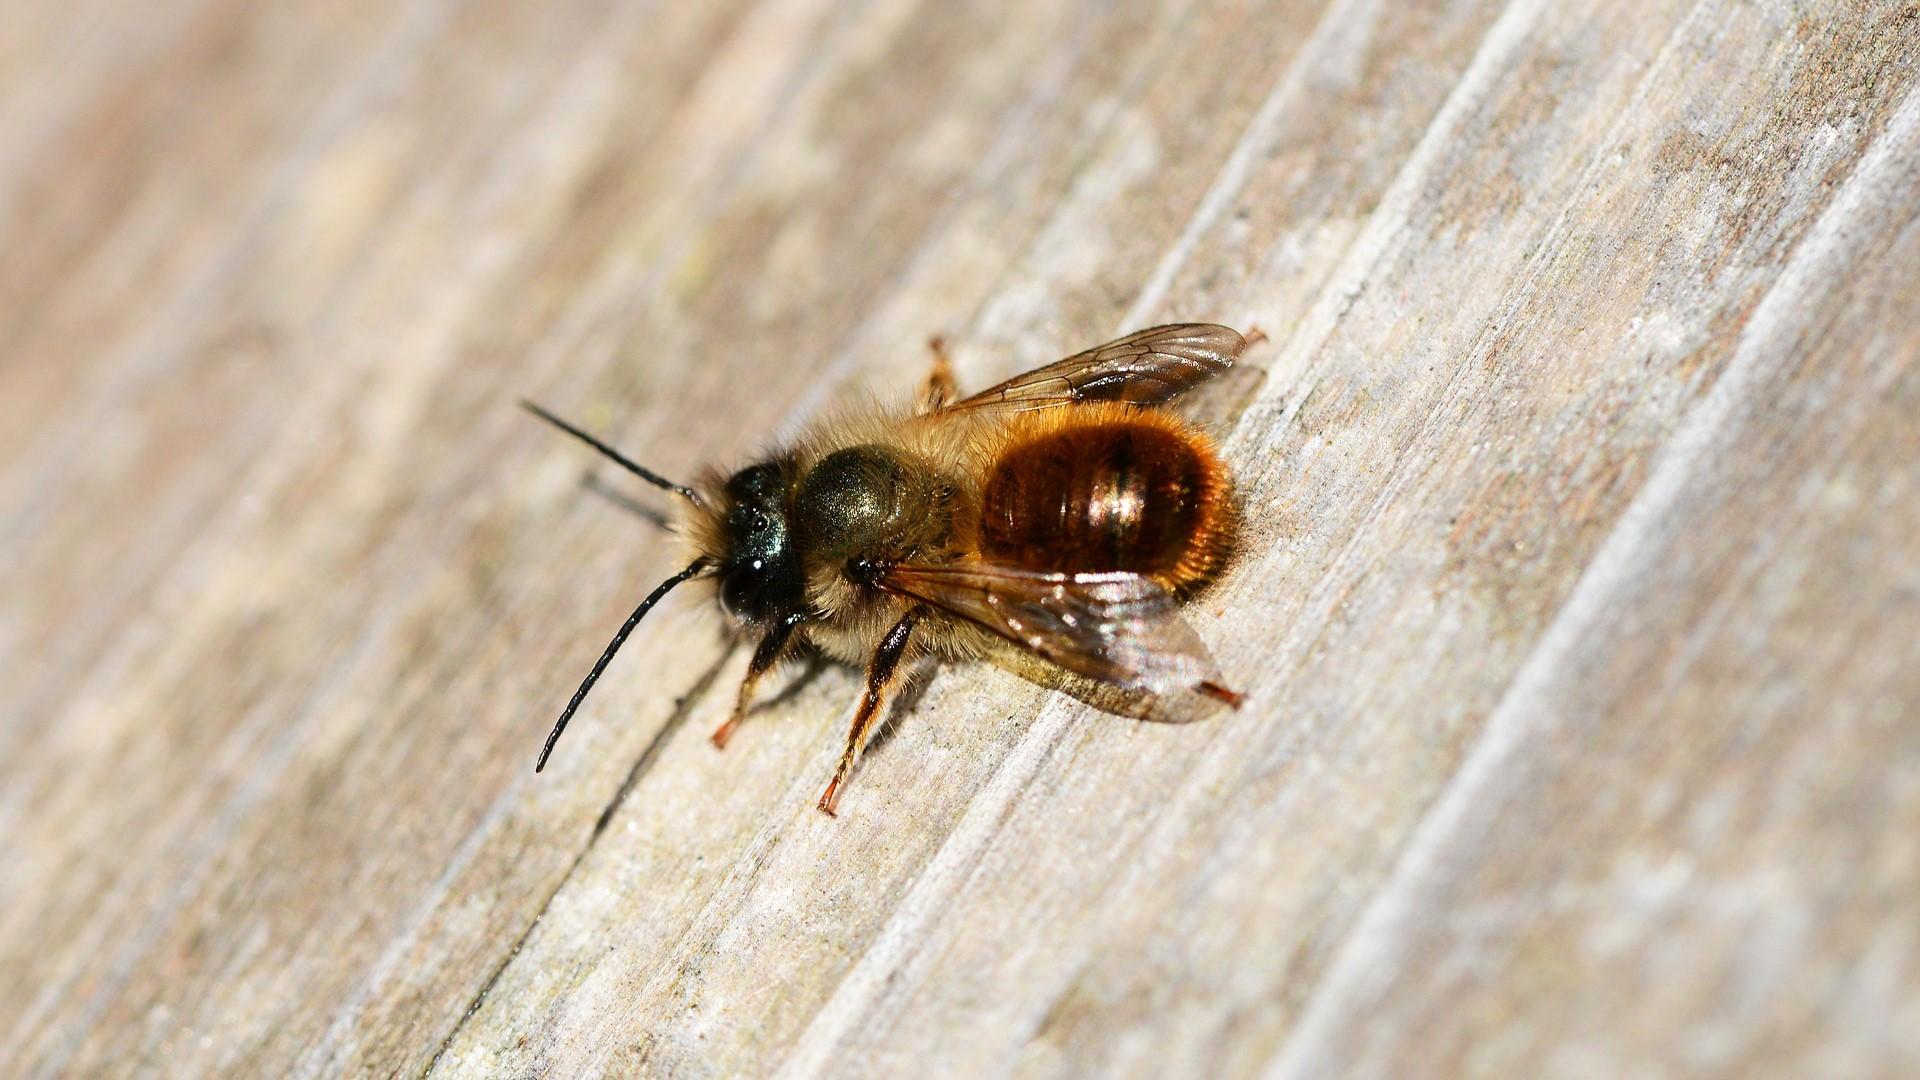 Attract Bees - Attract mason bees - Red Mason Bee